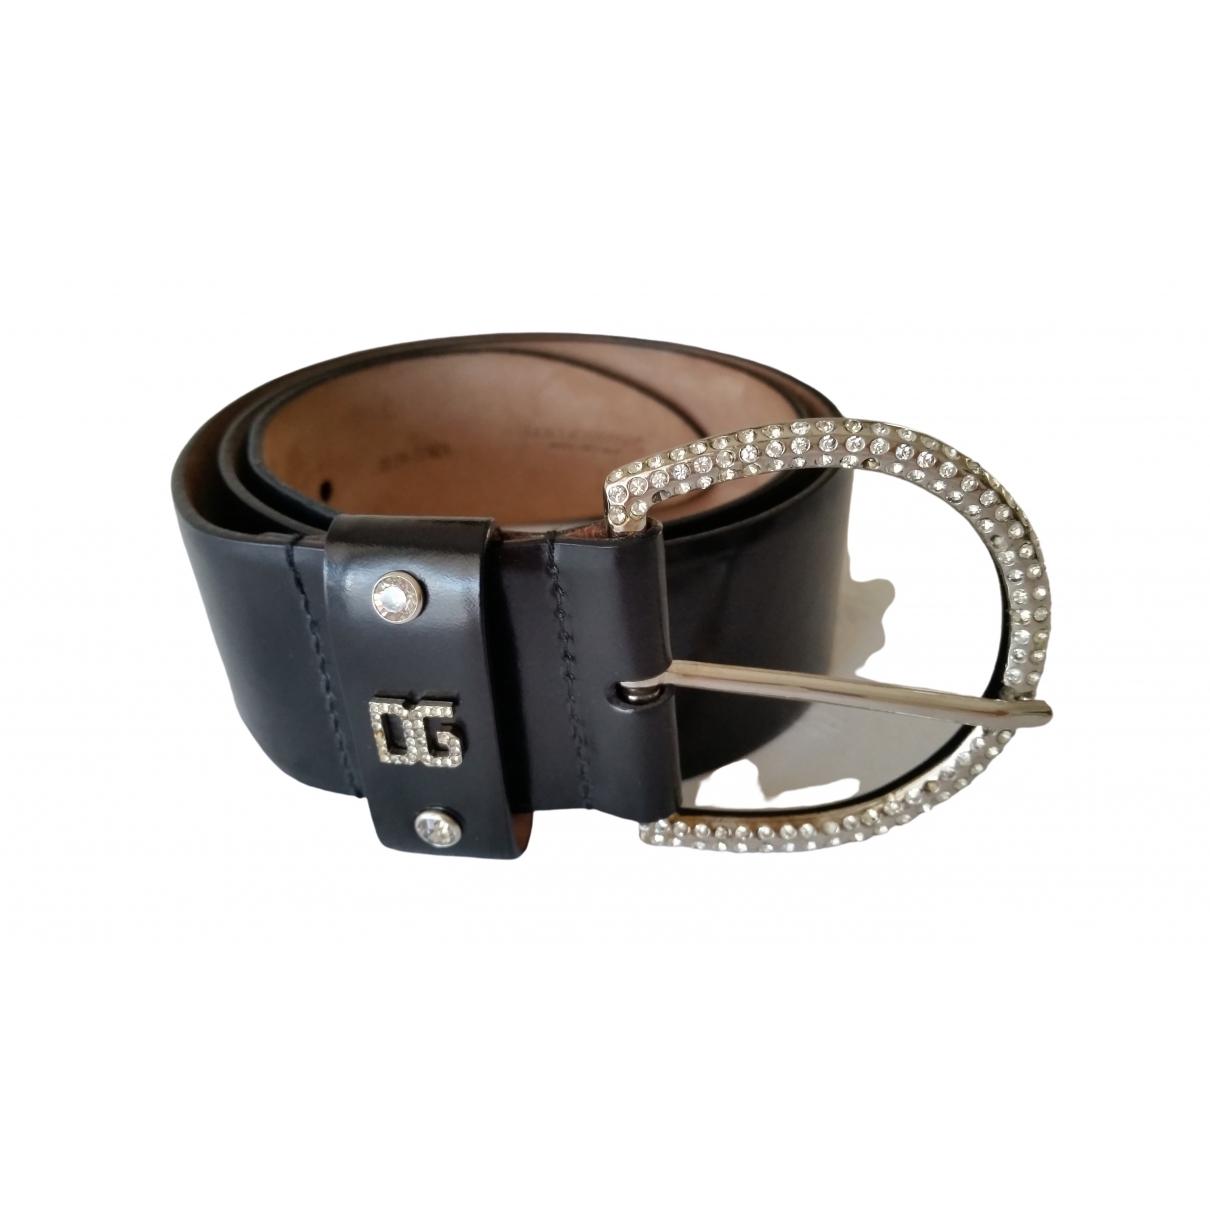 Dolce & Gabbana \N Black Leather belt for Women 80 cm